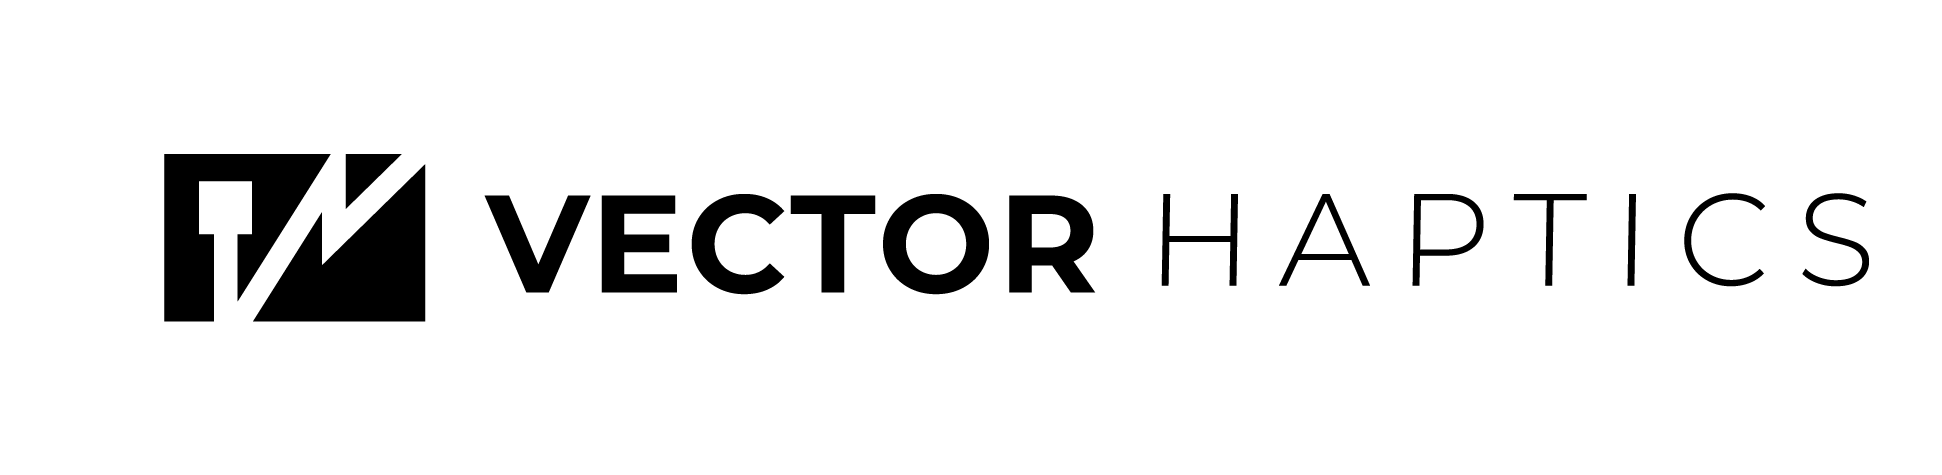 Vector Haptics logo 02